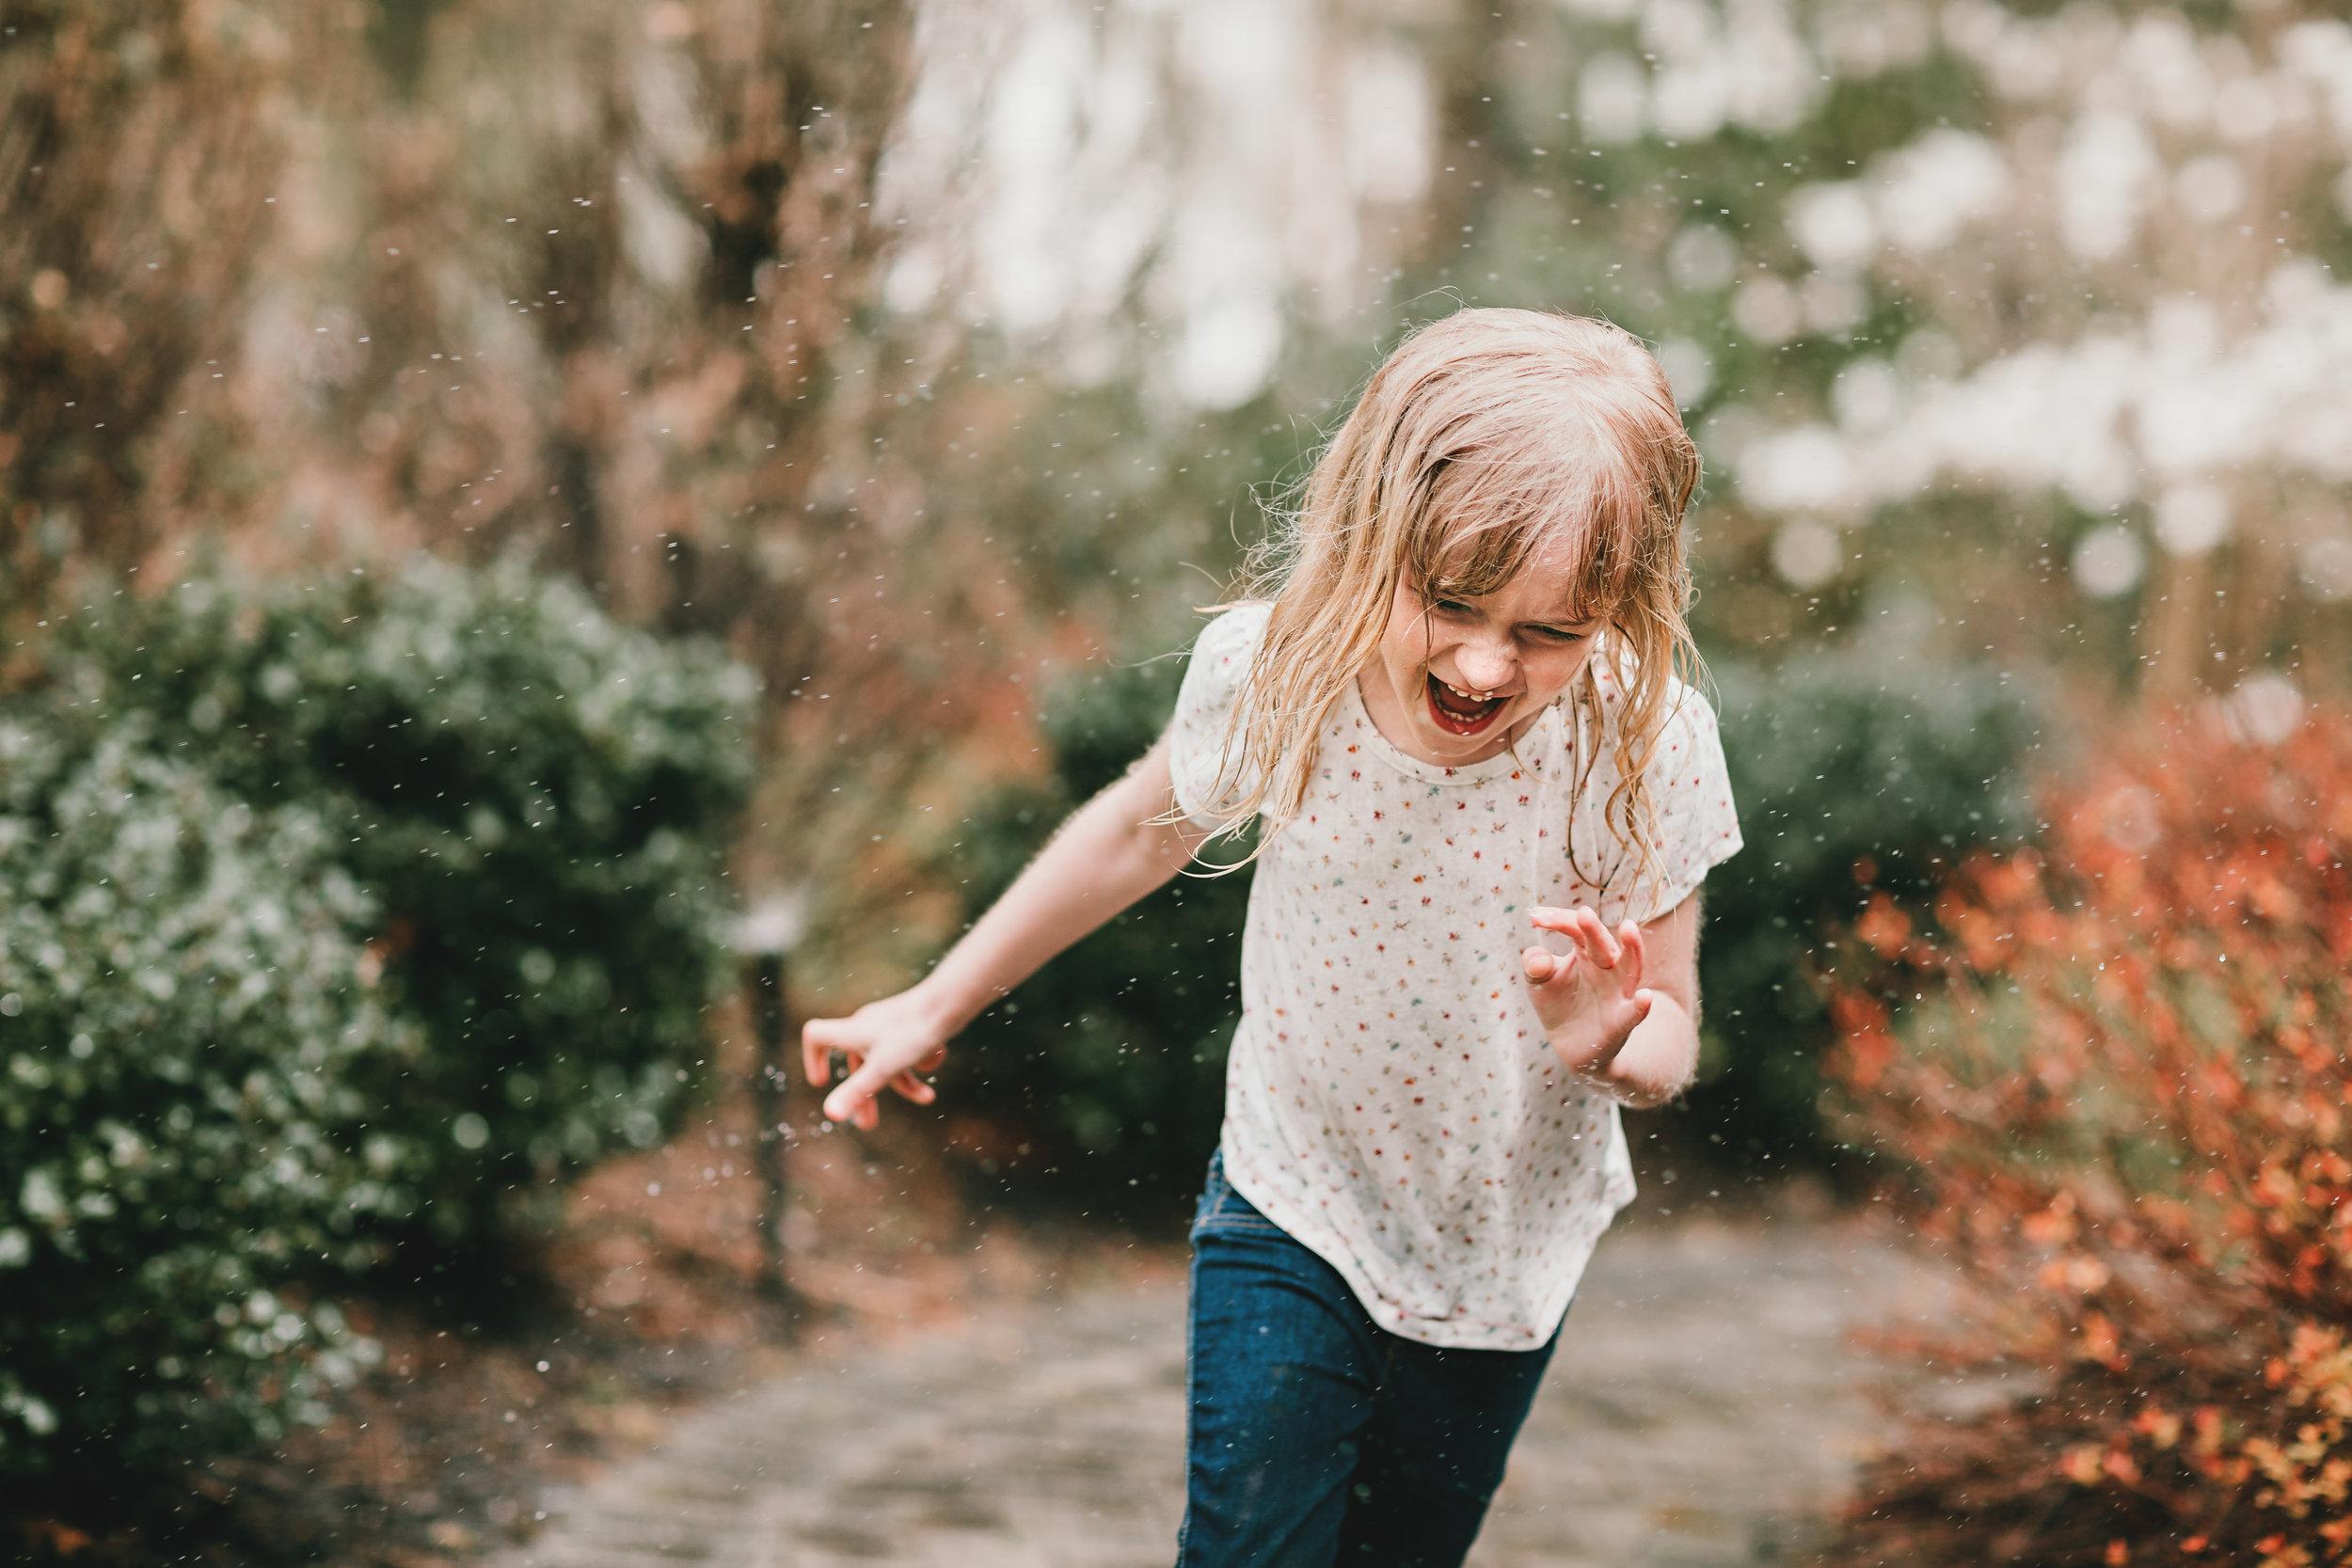 Hello-olivia-photography-long-island-photographer-children-lifestyle-running-through-sprinkler.jpg